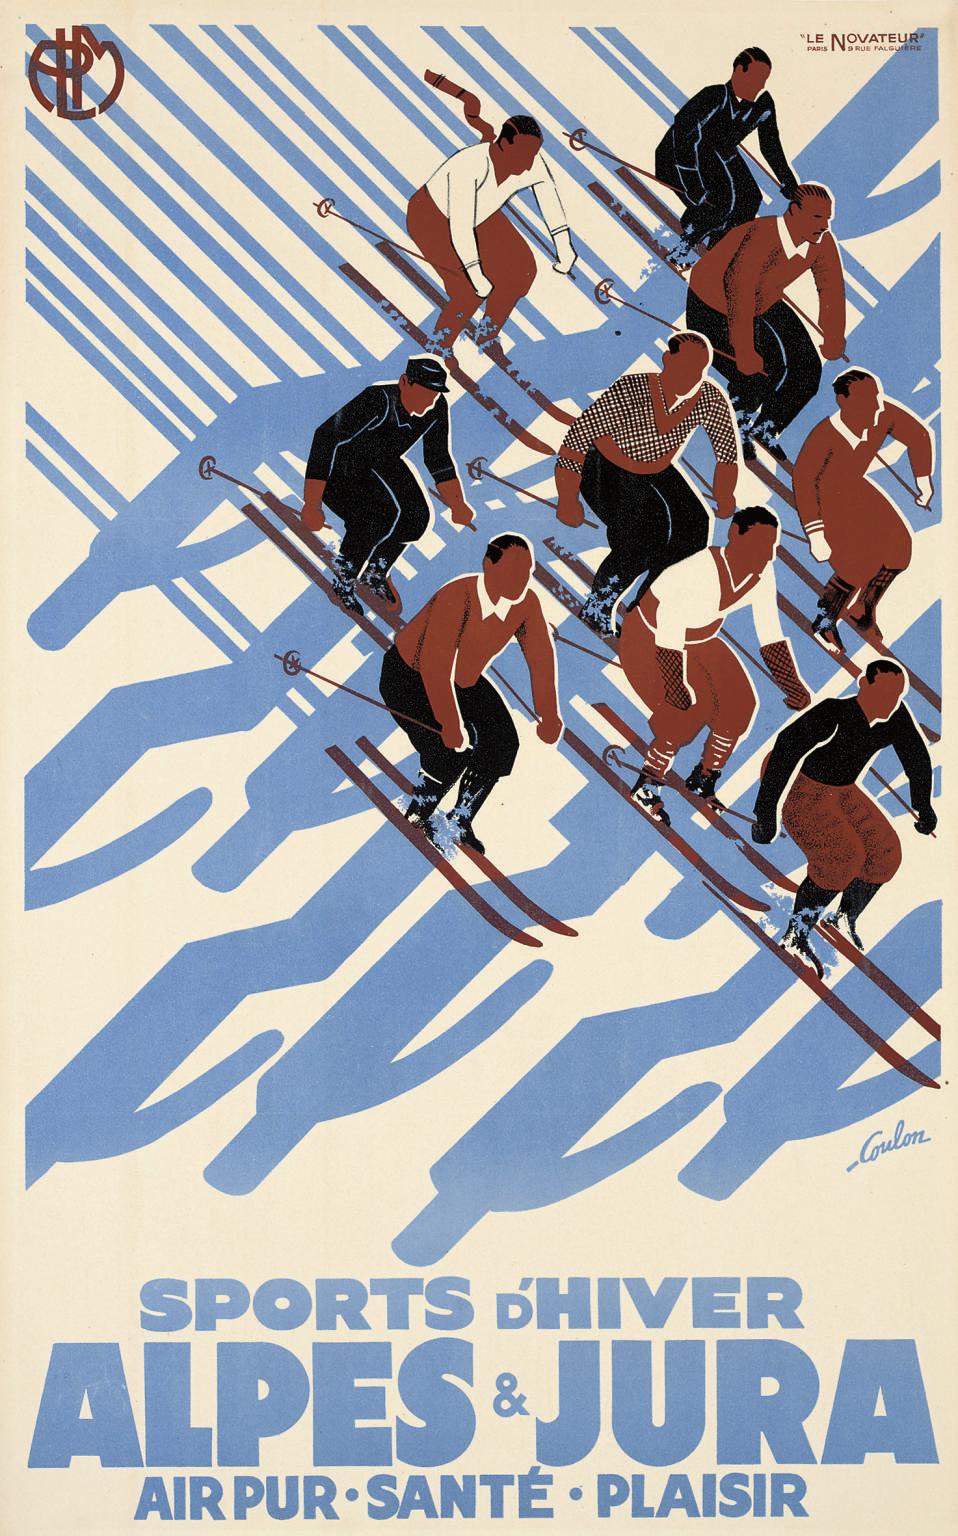 COULON, ERIC DE (1888-1956)